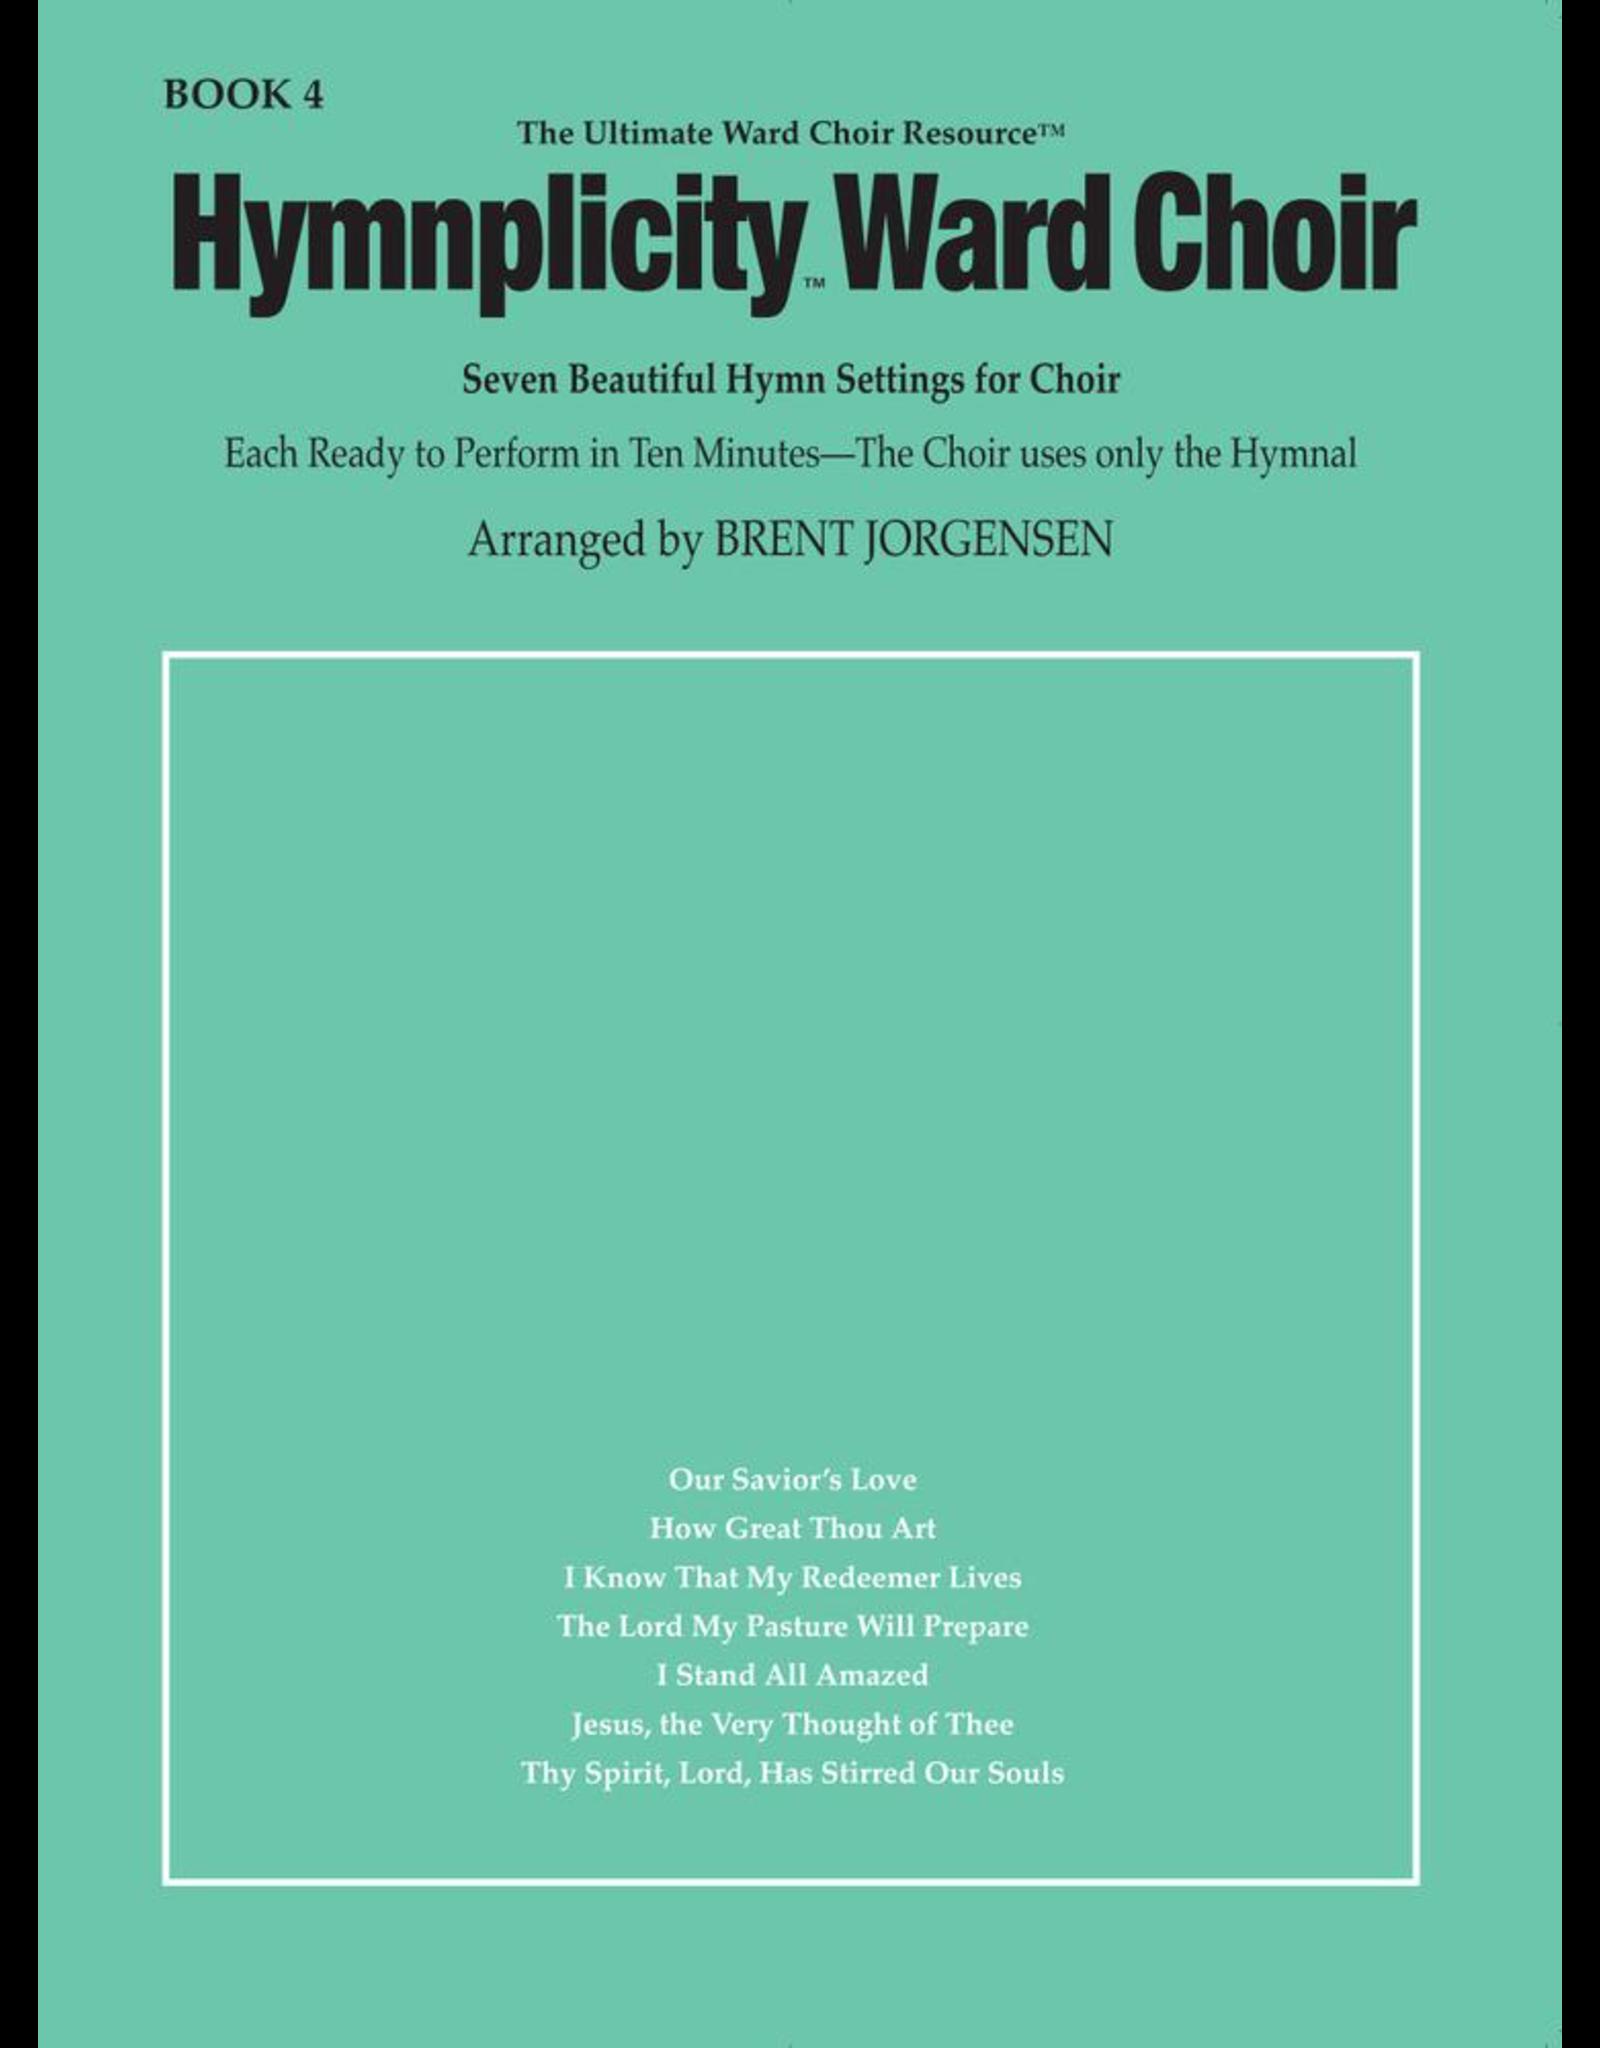 Jackman Music Hymnplicity Ward Choir, Book 4